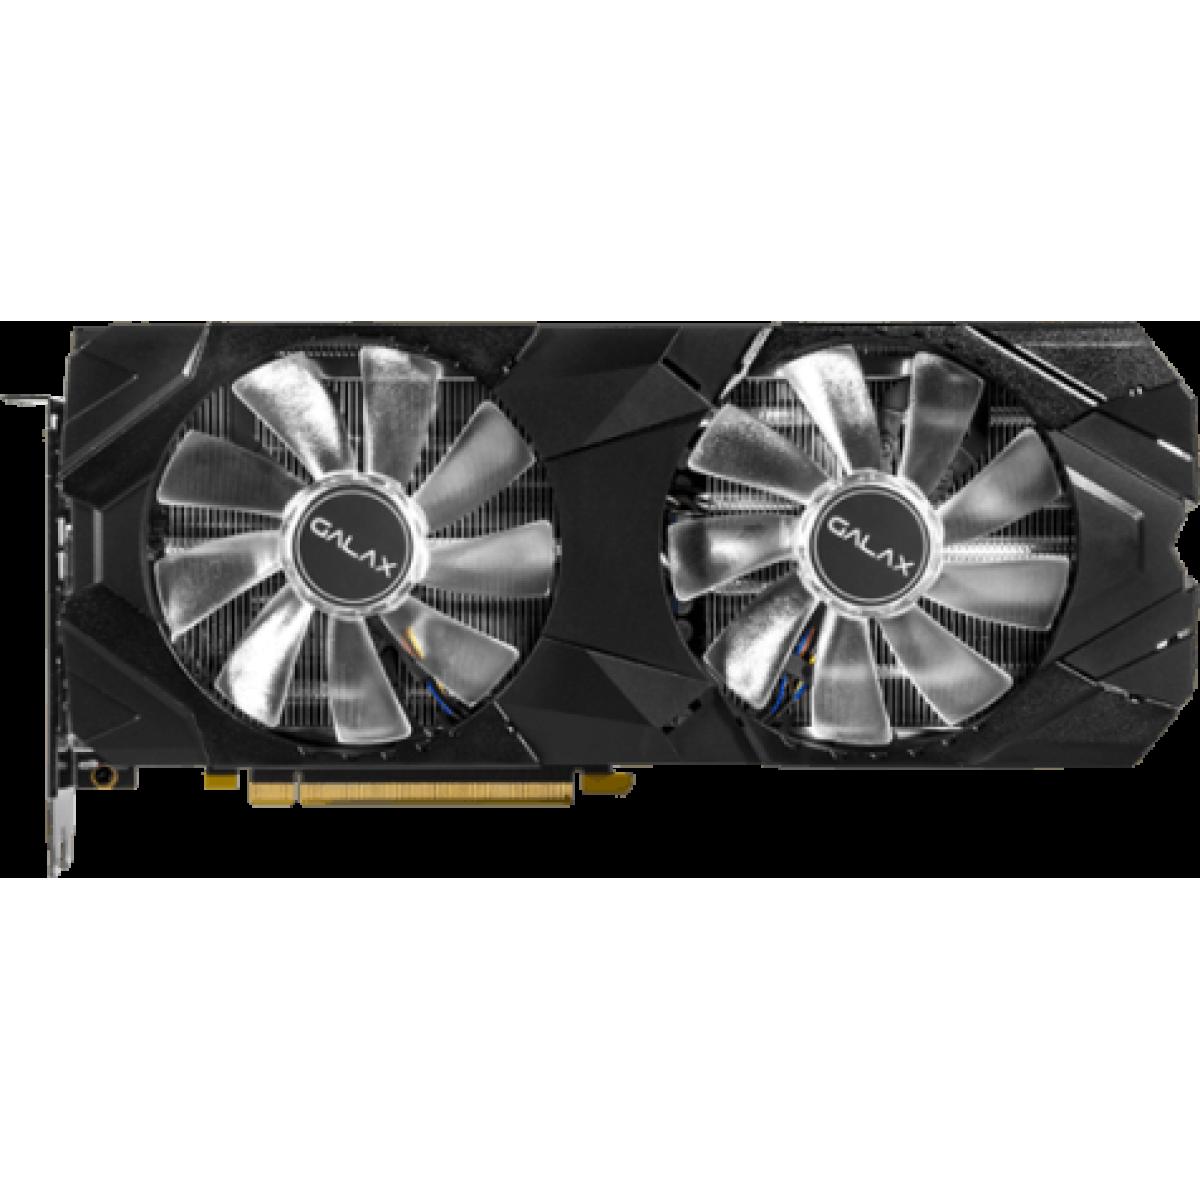 Placa de Vídeo Galax Geforce RTX 2080 EX (1-Click OC) Dual, 8GB GDDR6, 256Bit, 28NSL6MDU9E2